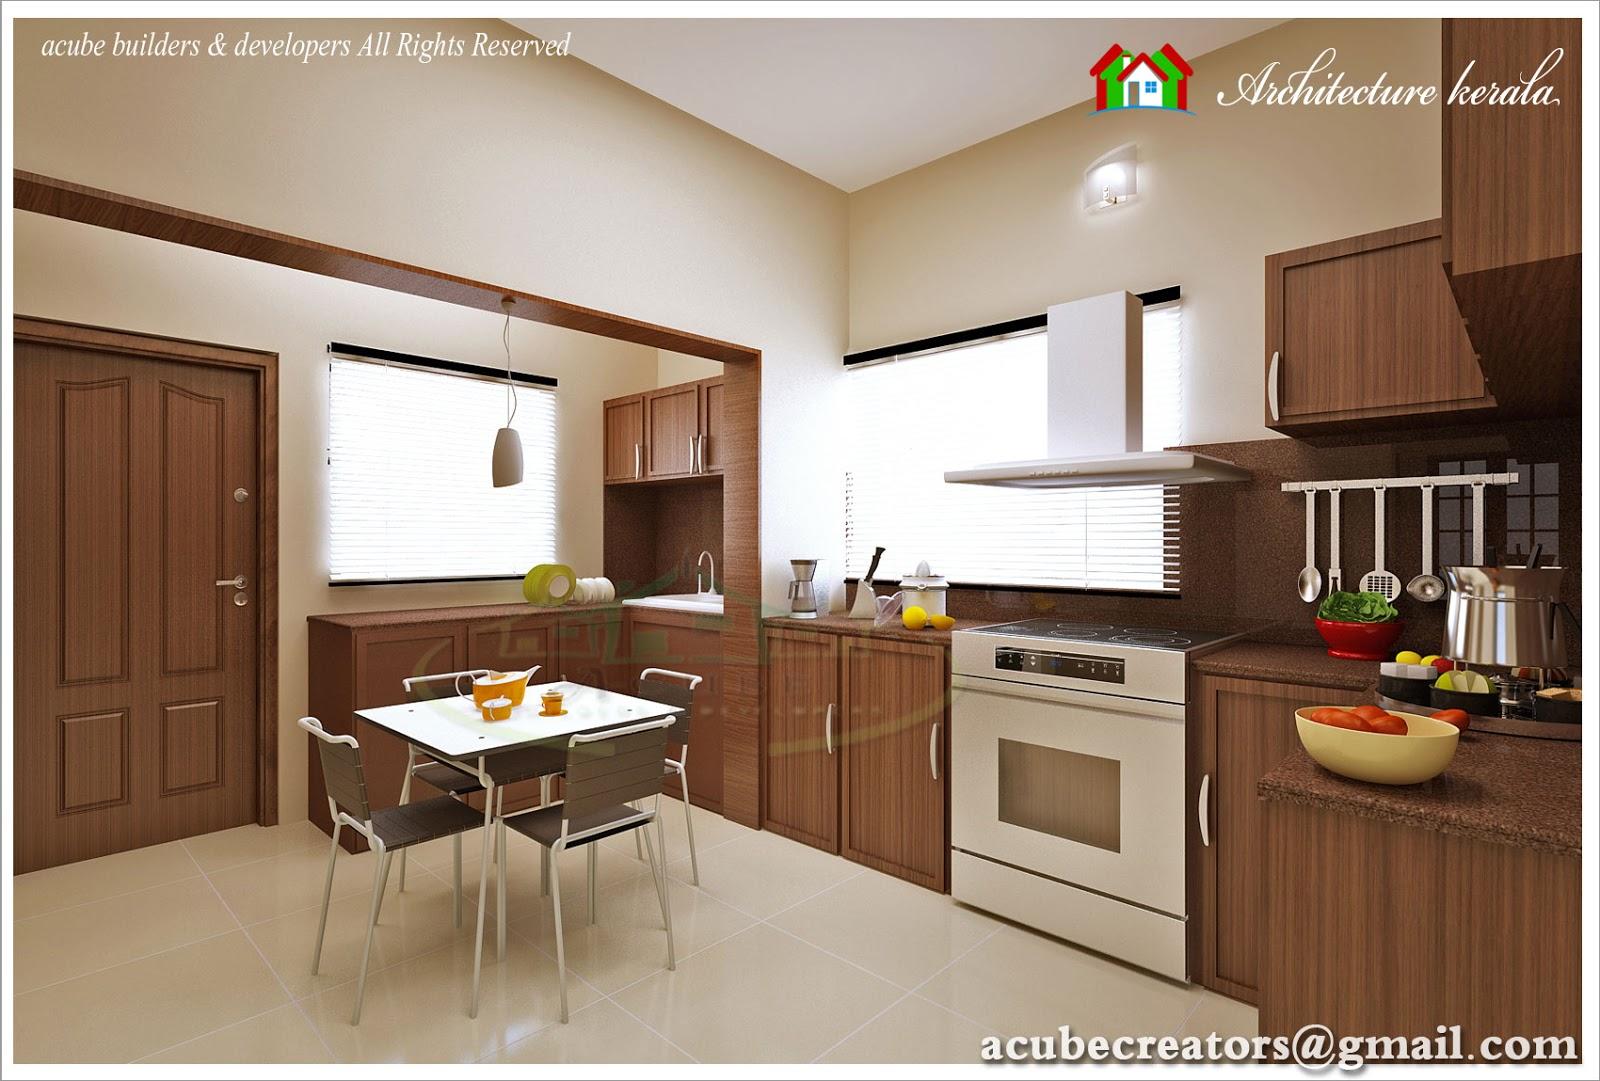 modular kitchen interior design - architecture kerala